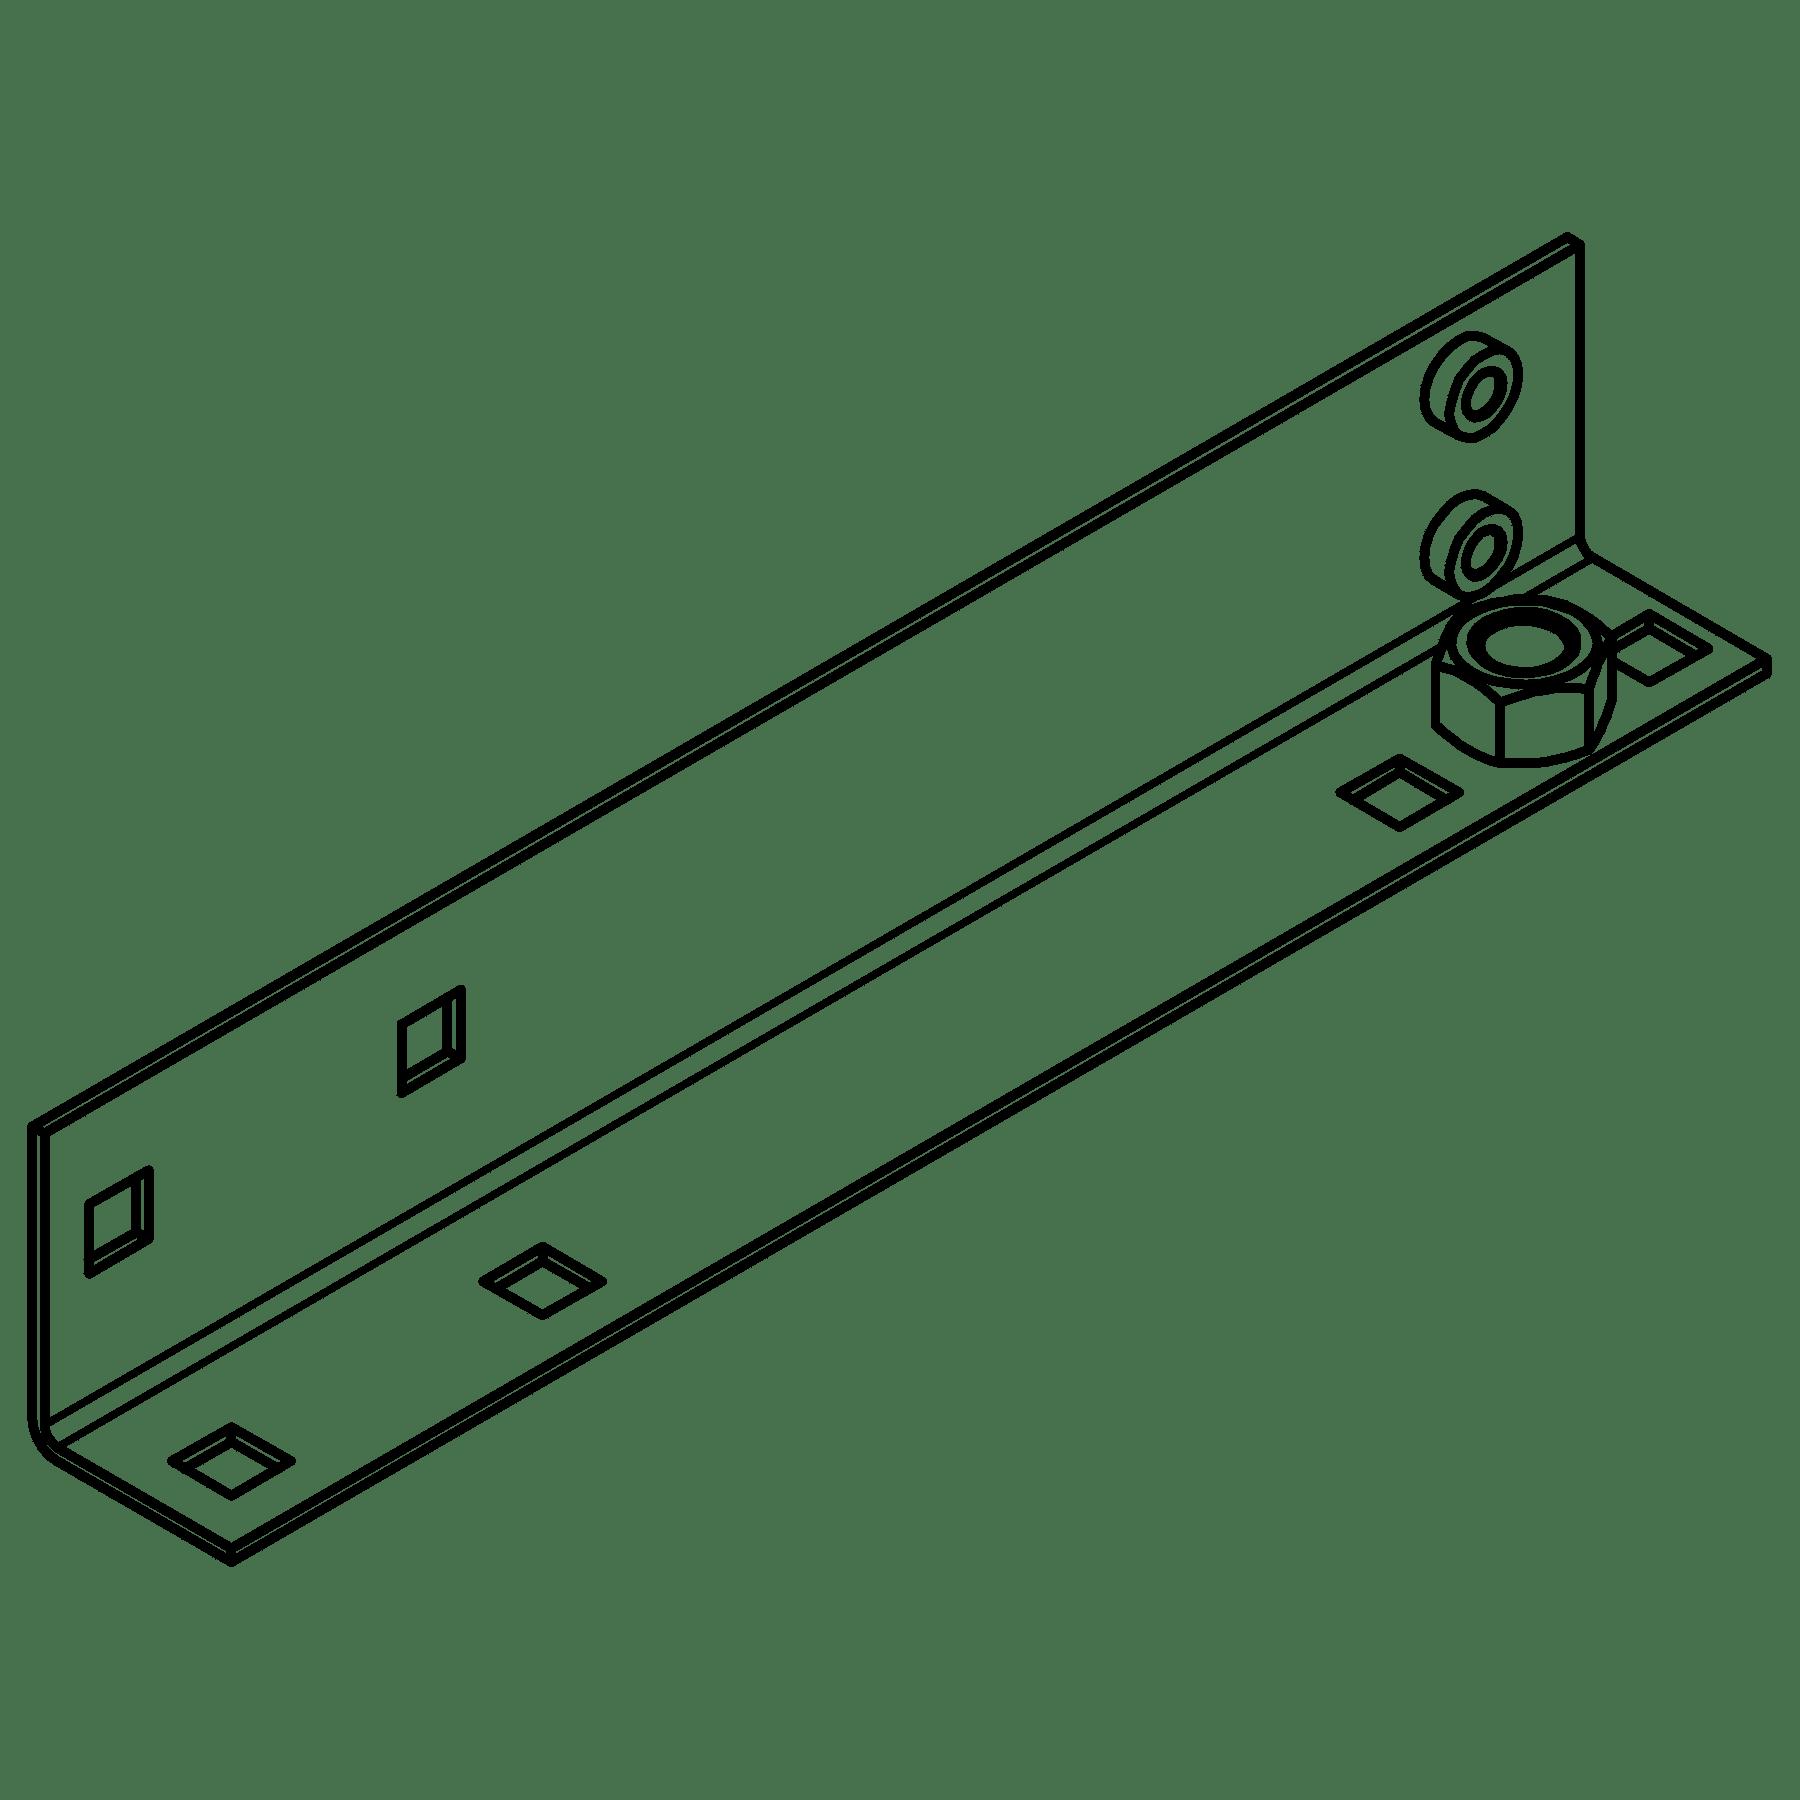 CA5650011 - MET L-BRACKET OPR5xx LEFT SIDE - BLACK